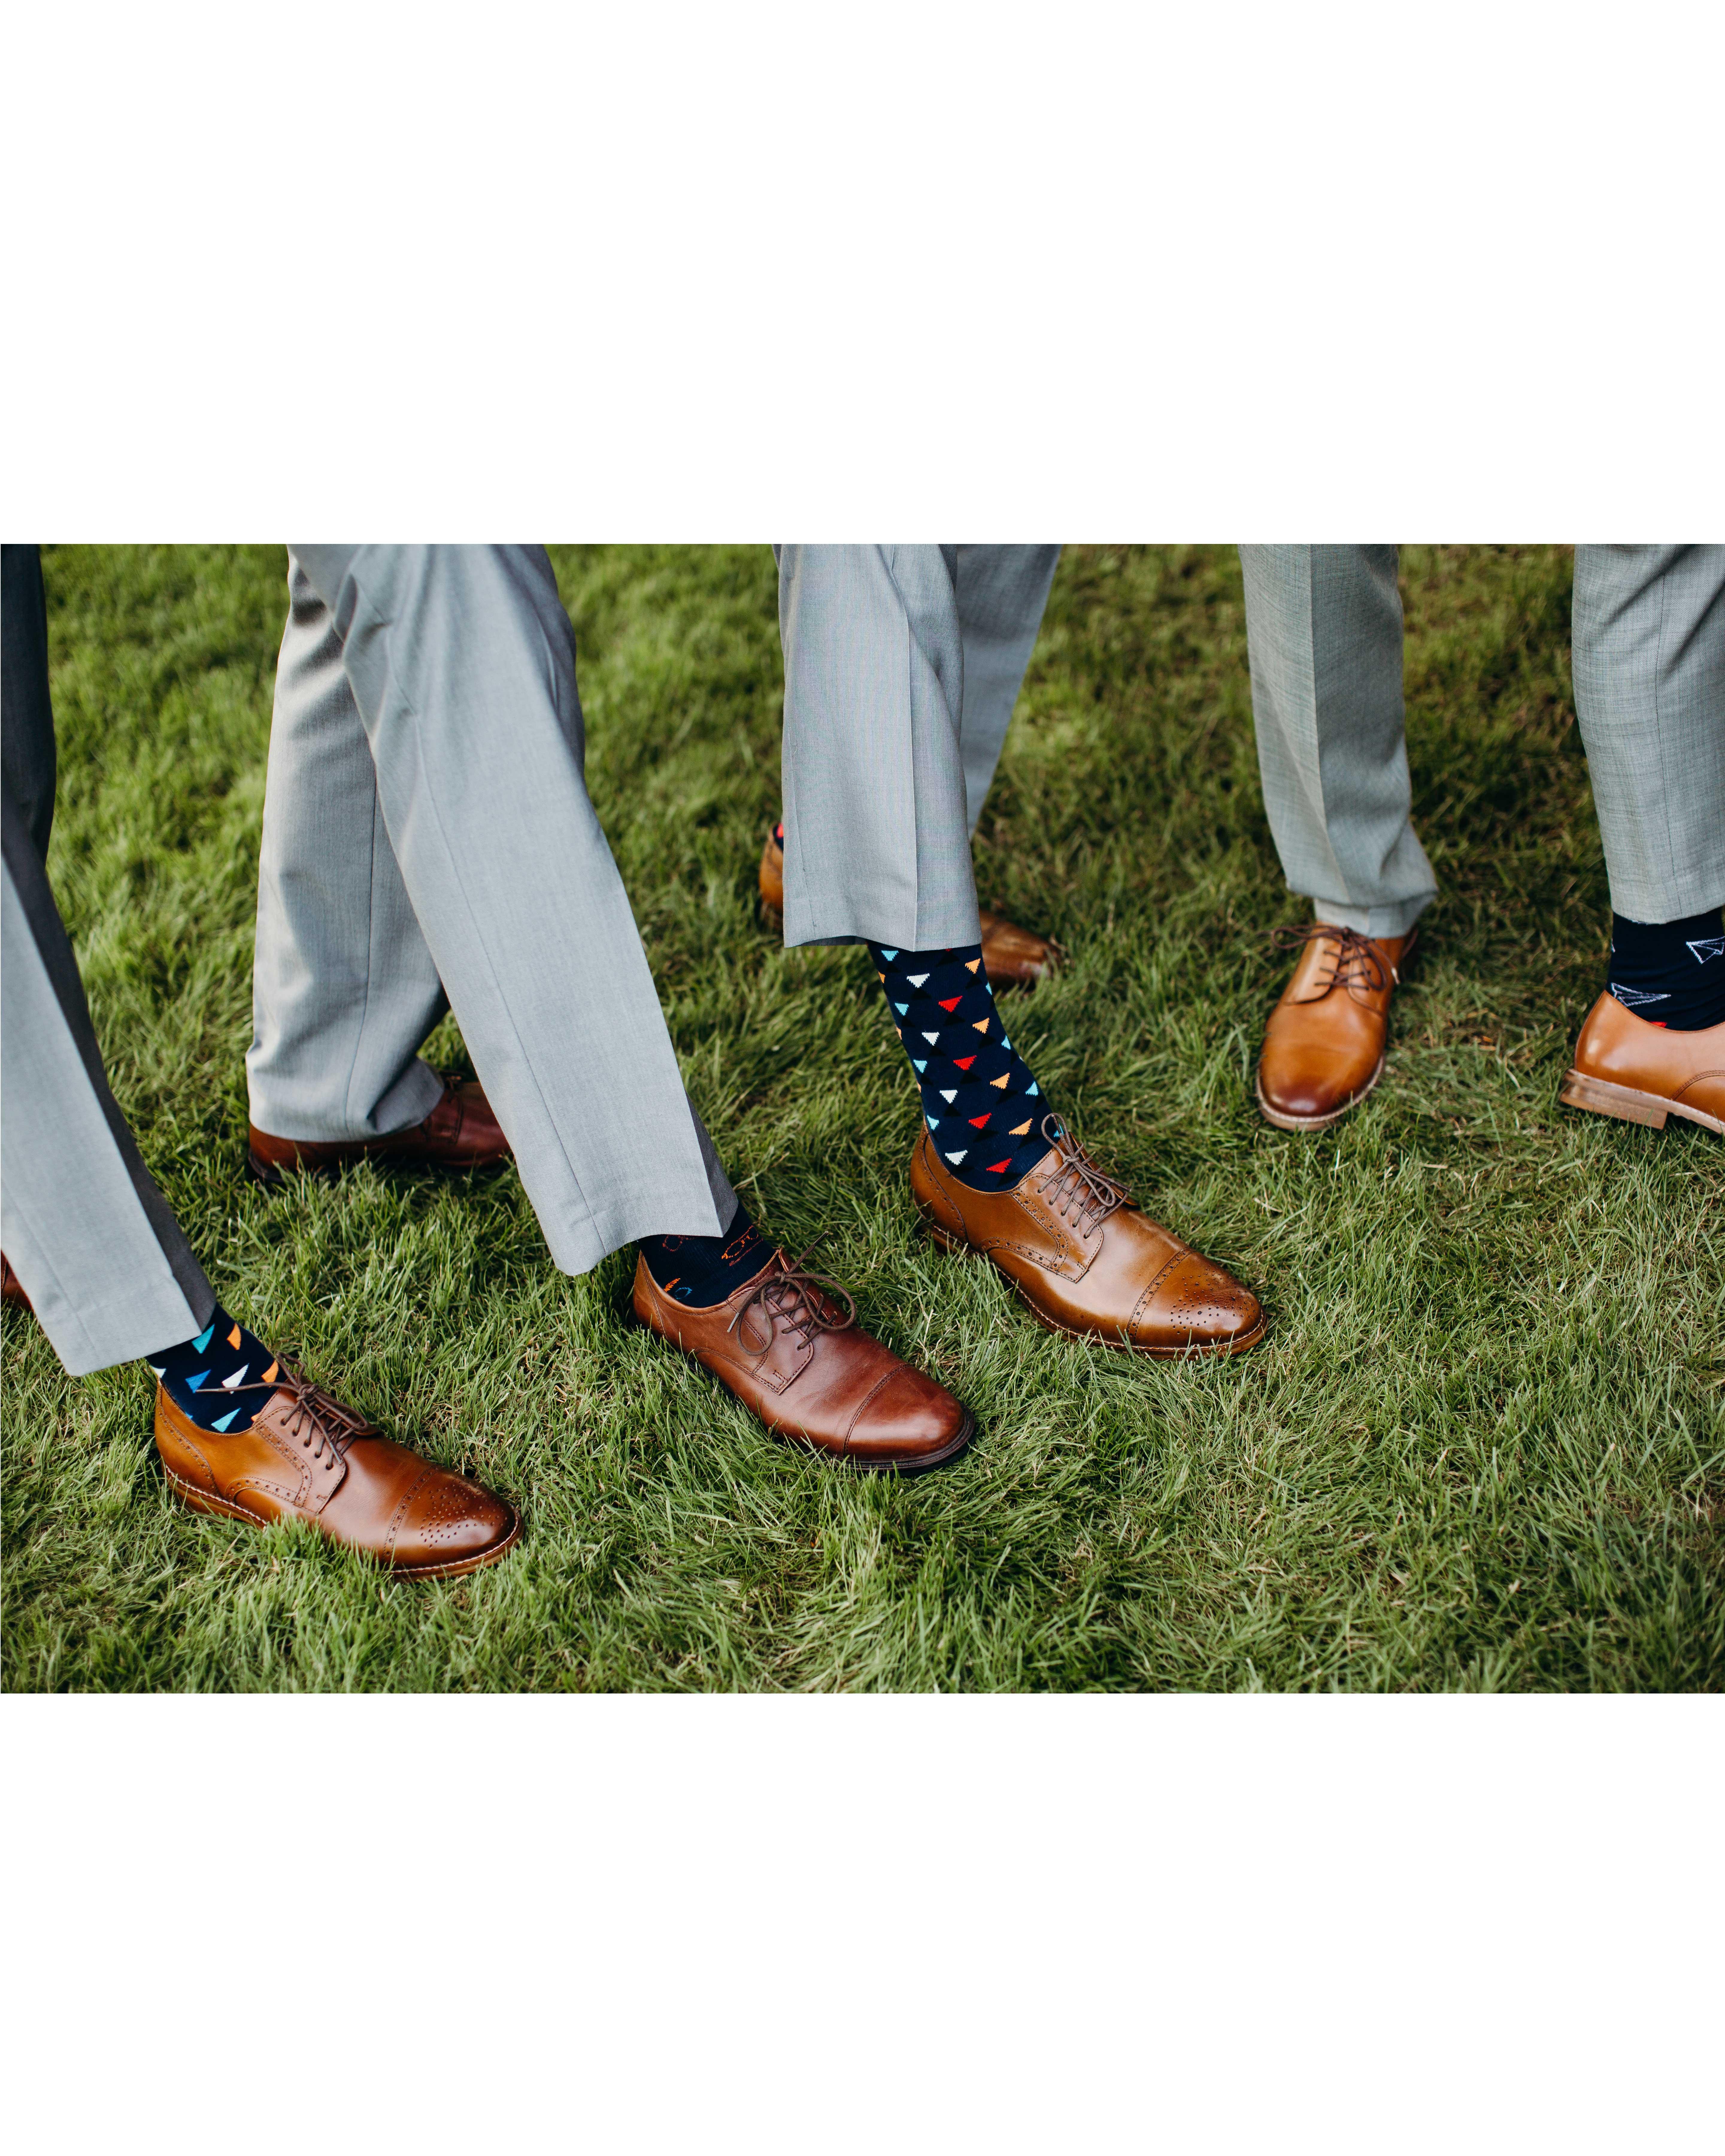 groomsmen wedding socks